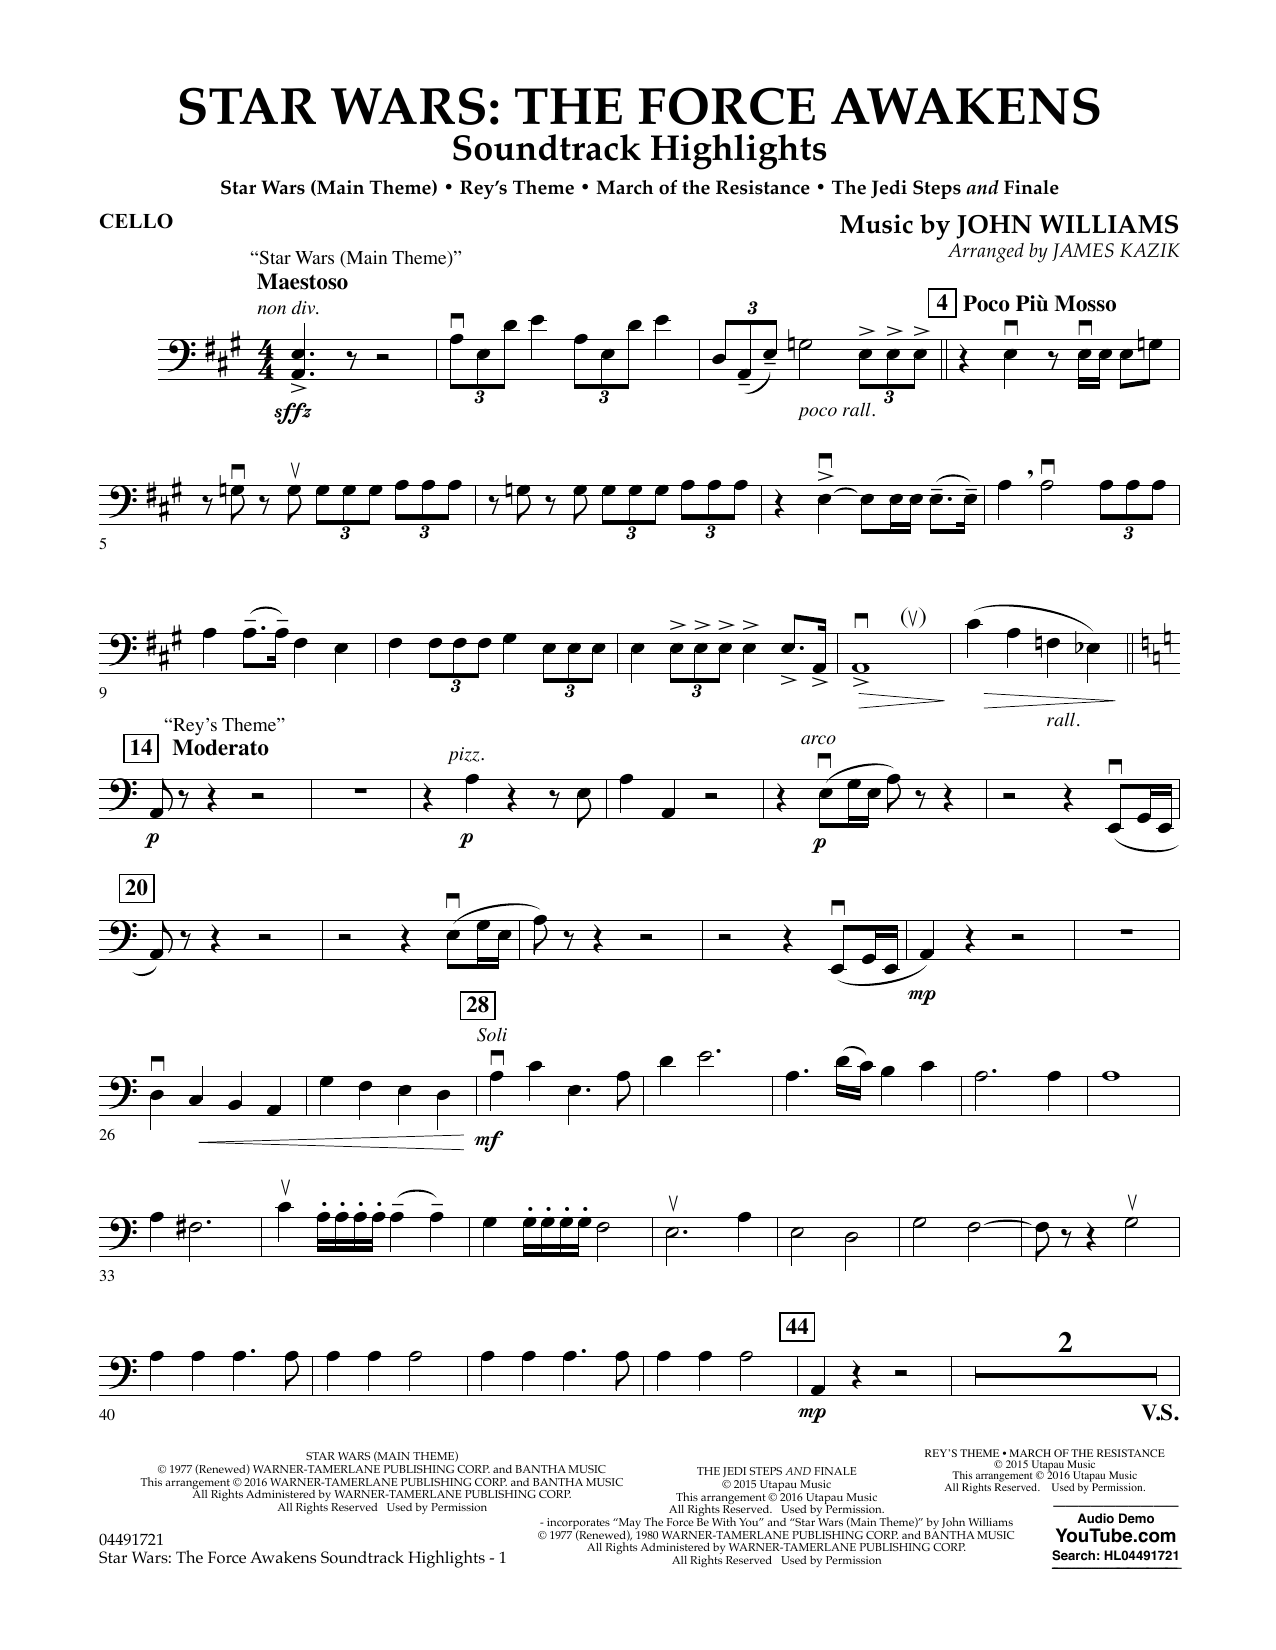 John Williams - Star Wars: The Force Awakens Soundtrack Highlights - Cello